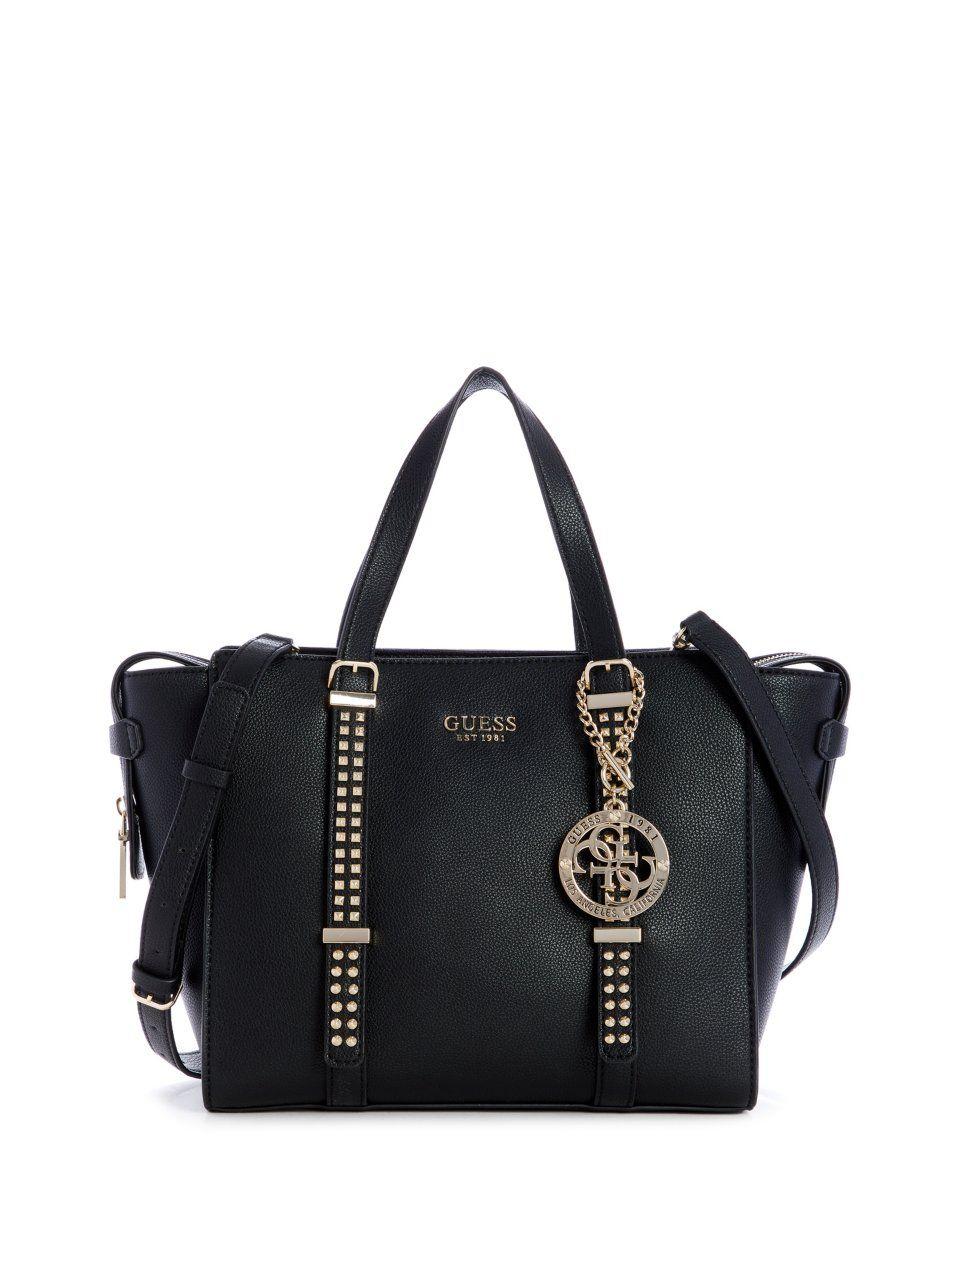 f46b3abe2a Eileen Studded Satchel | Products | Satchel, Bags, Handbag accessories